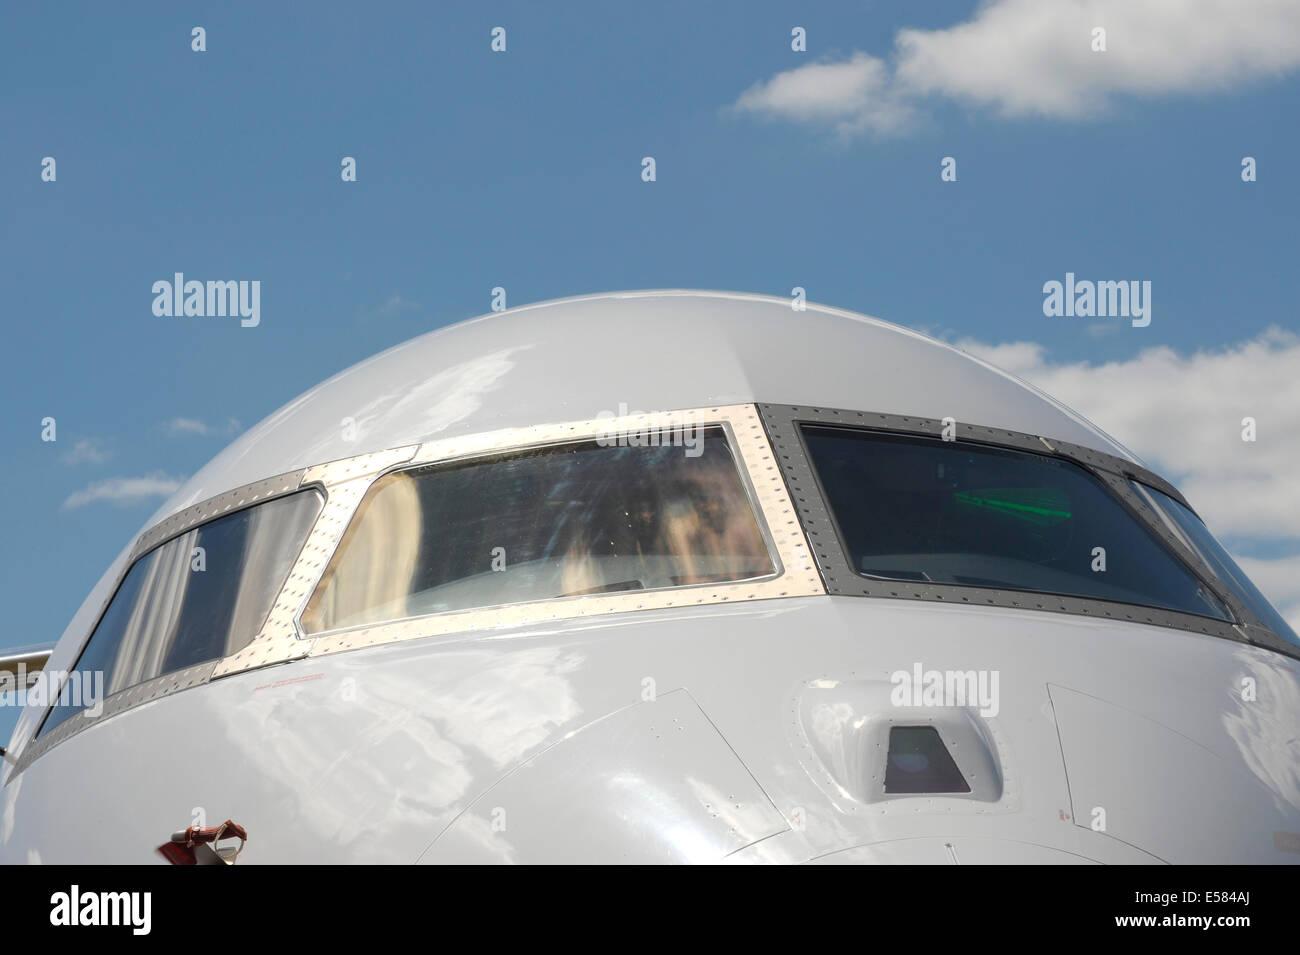 Bombardier Global 6000 Aircraft cockpit windows - Stock Image